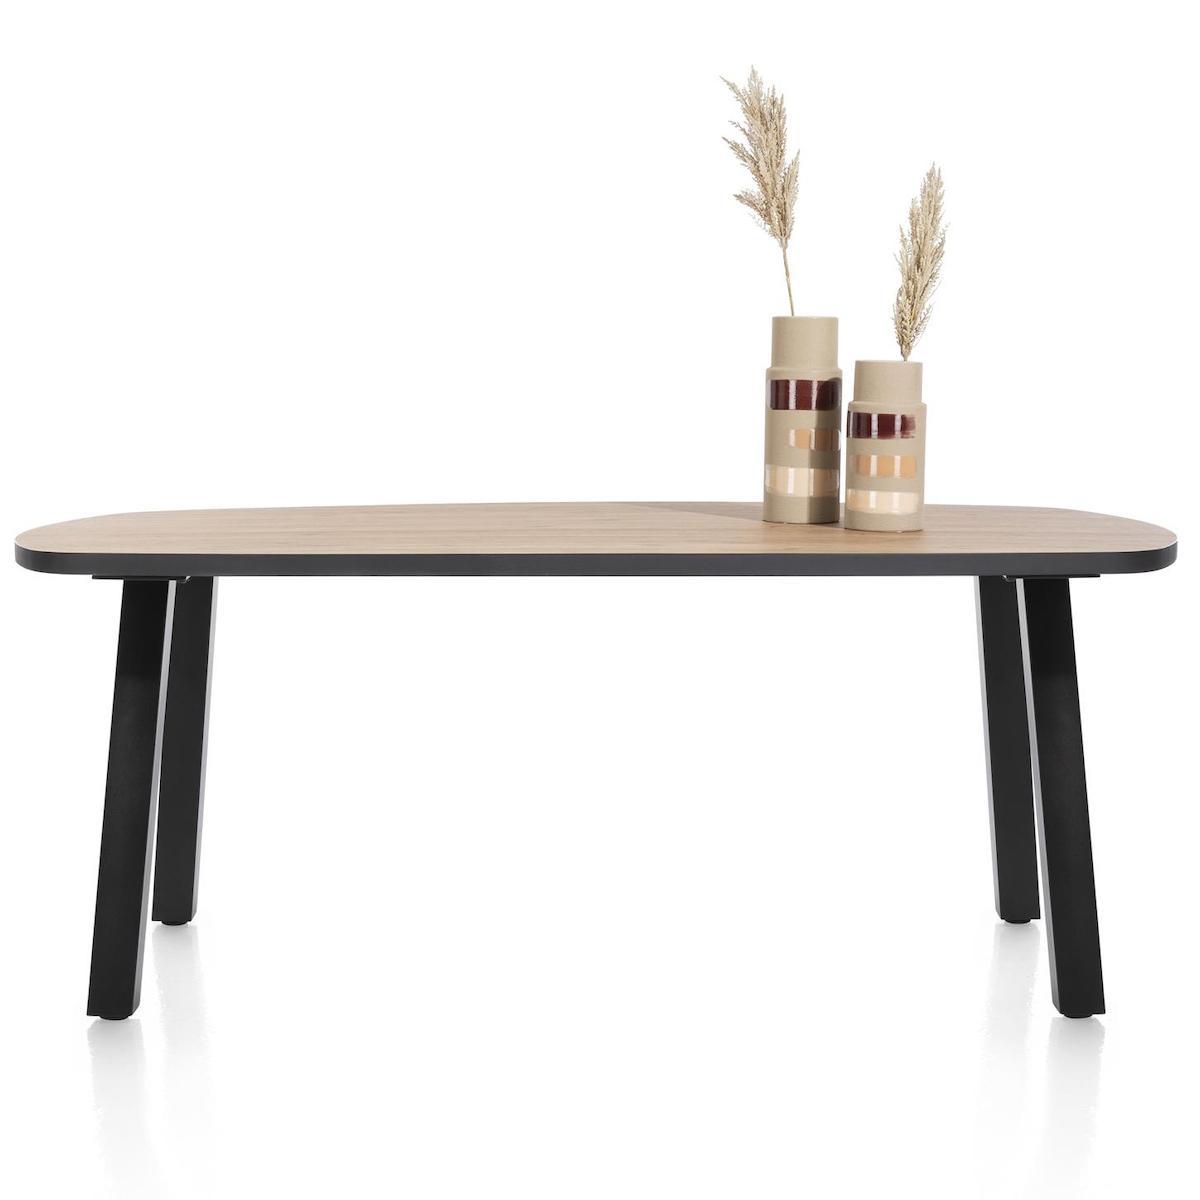 Table ovale 110x210cm AVALOX Henders & Hazel chêne natural vintage-pieds simple